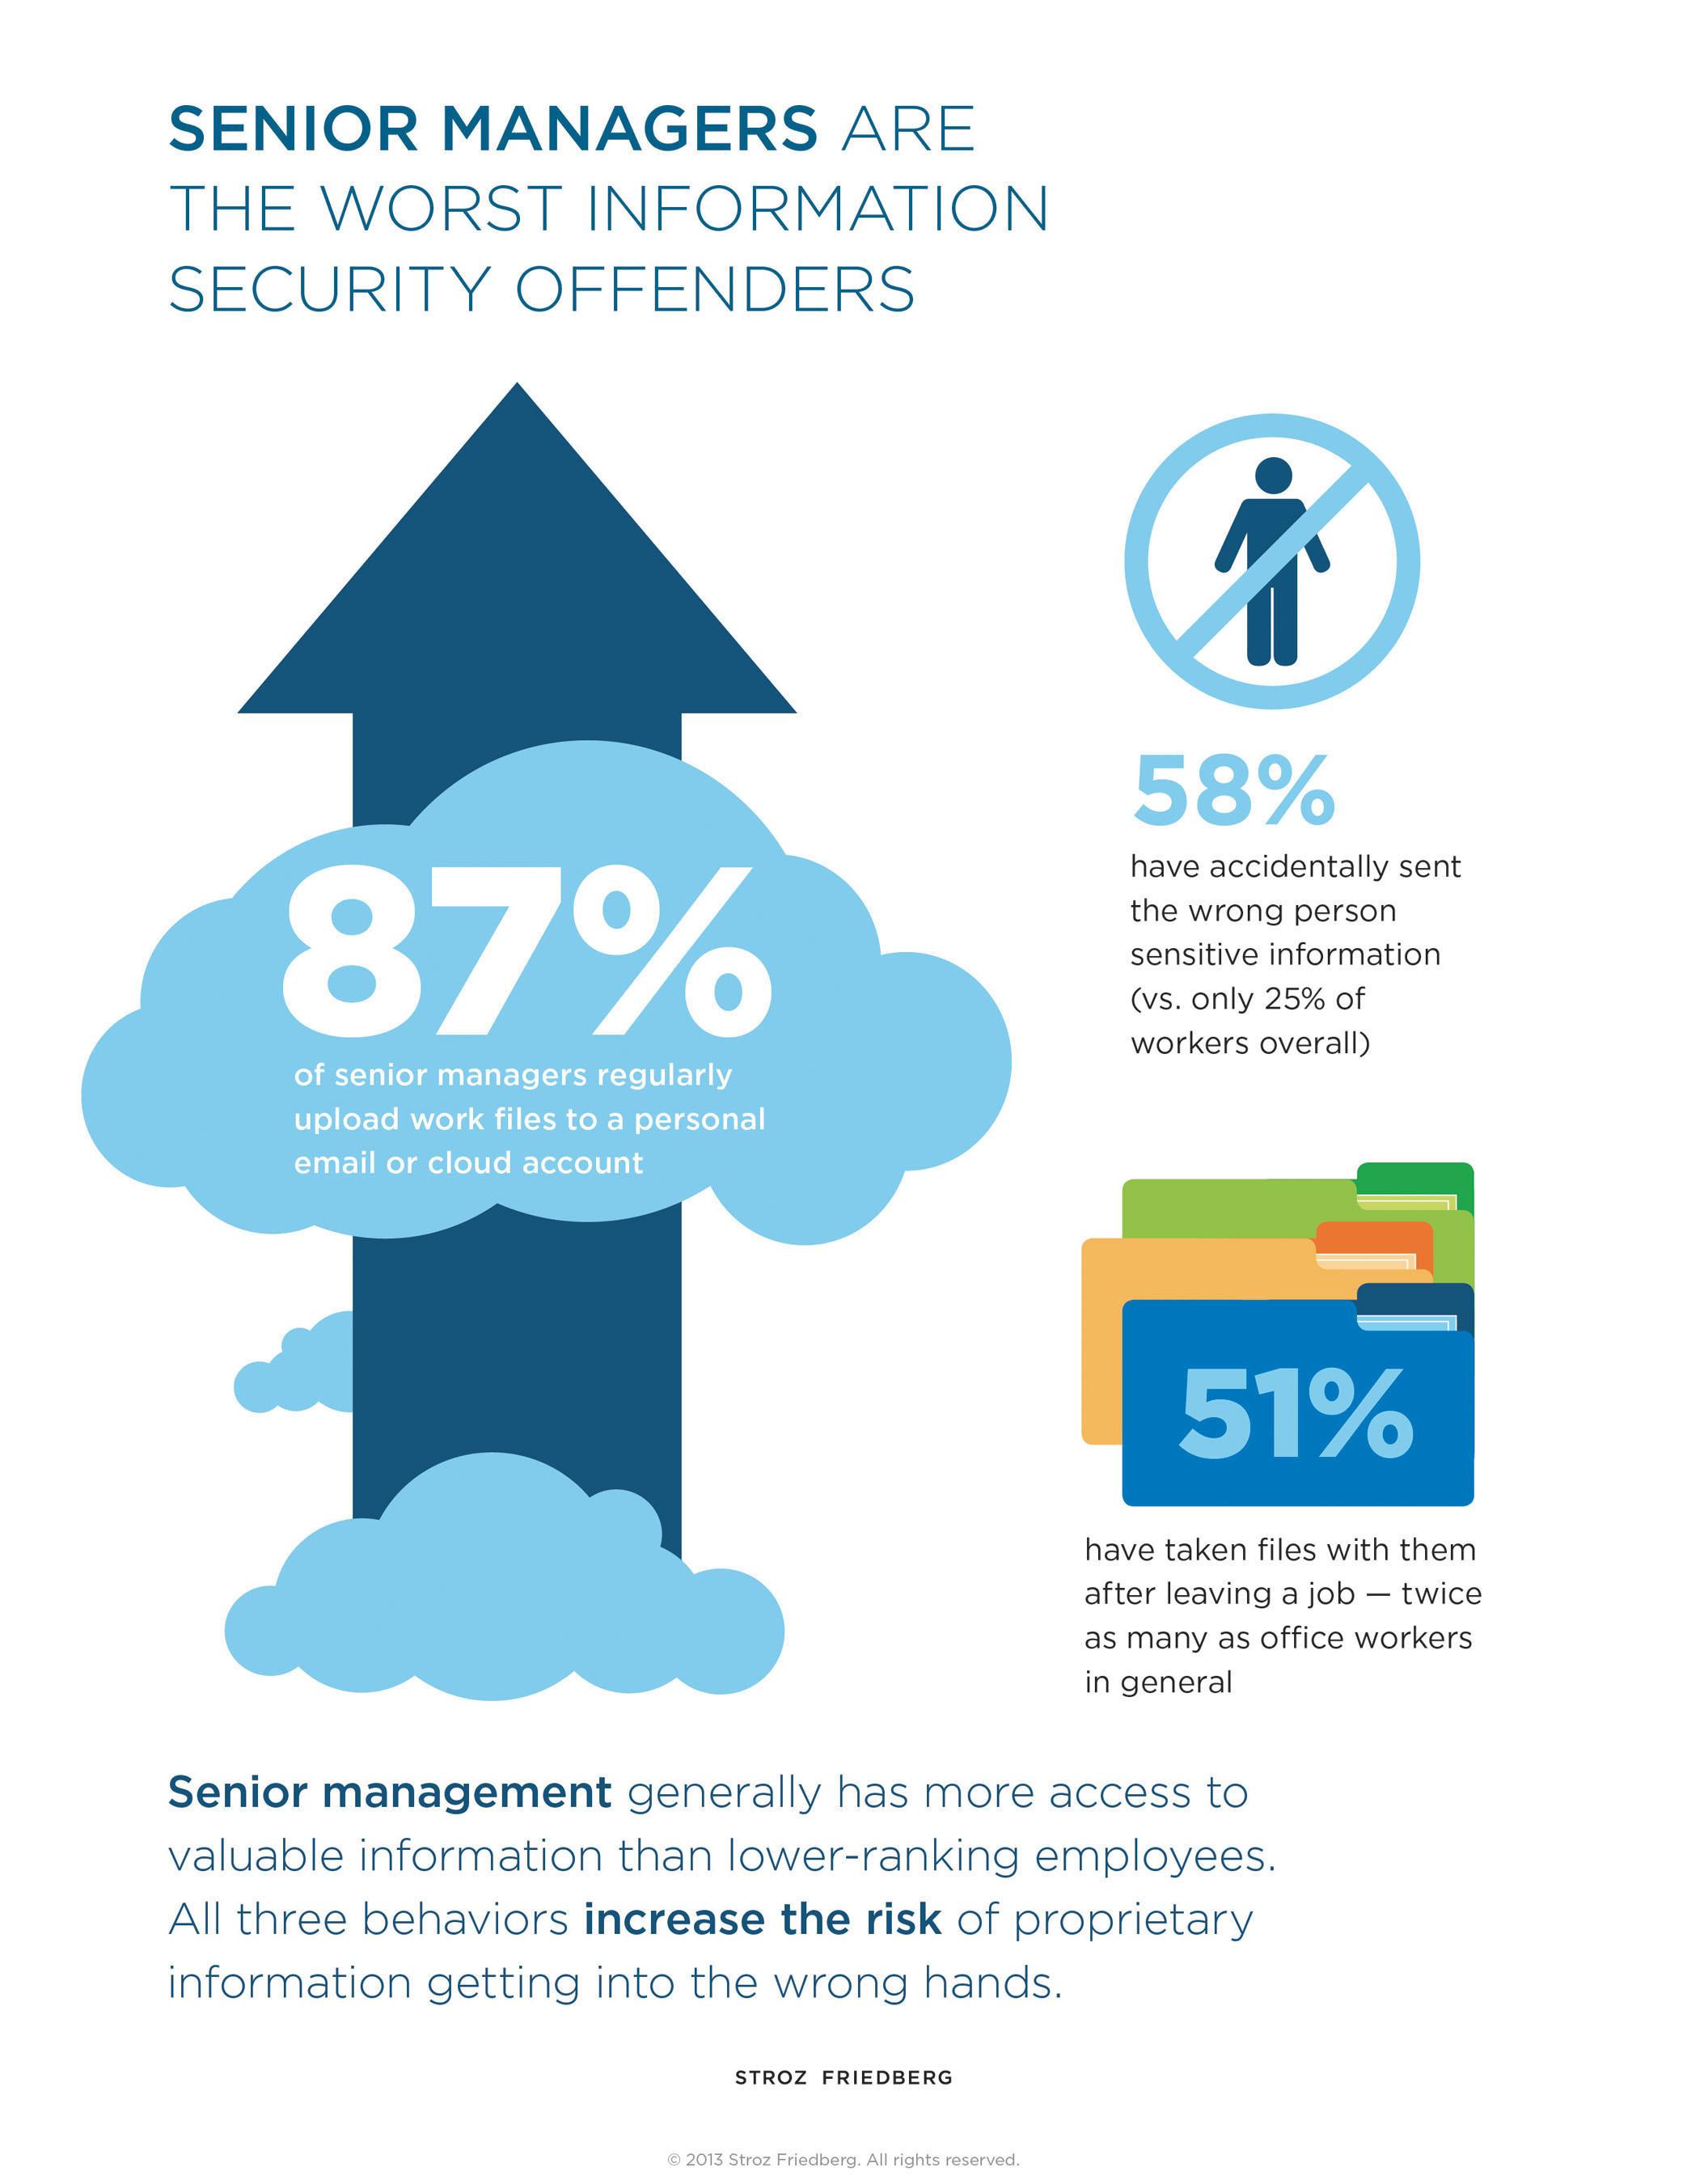 On the Pulse: Information Security Risk in American Business. (PRNewsFoto/Stroz Friedberg) (PRNewsFoto/STROZ ...